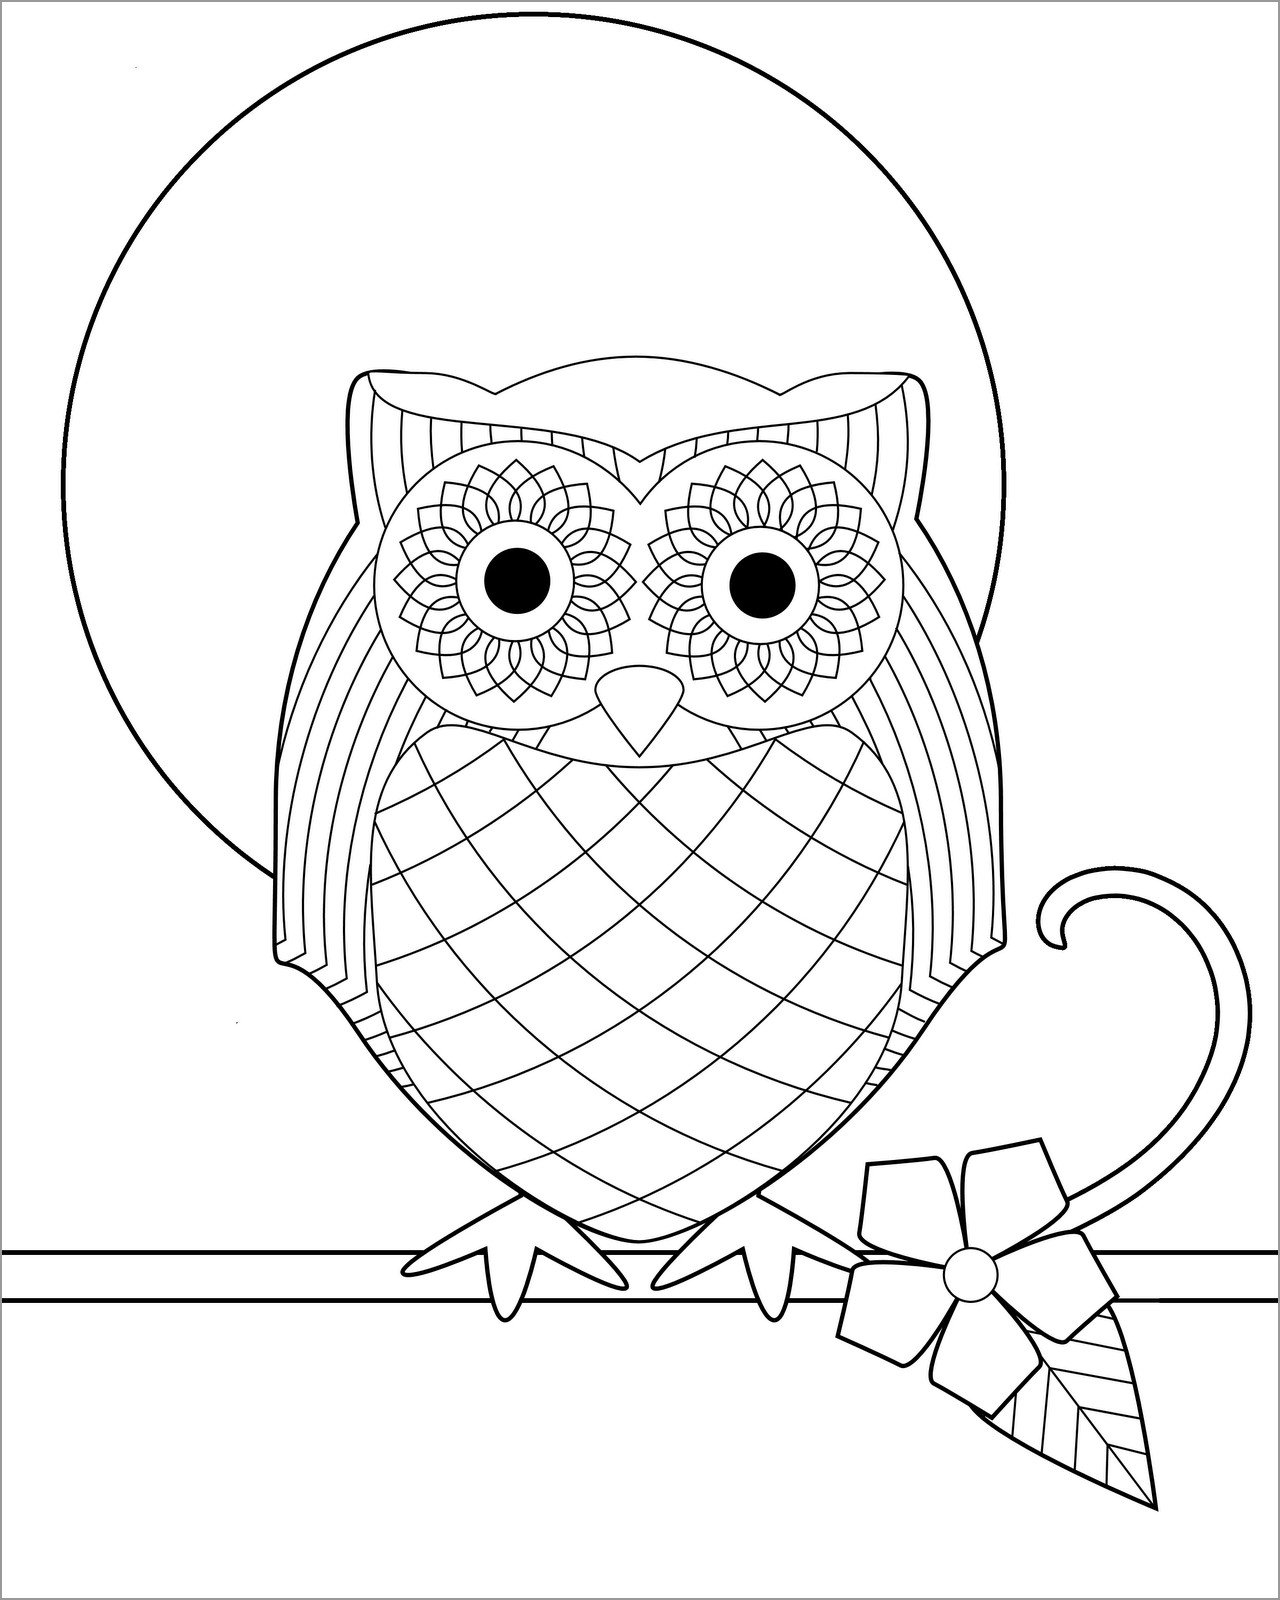 Easy Cartoon Owl Coloring Page